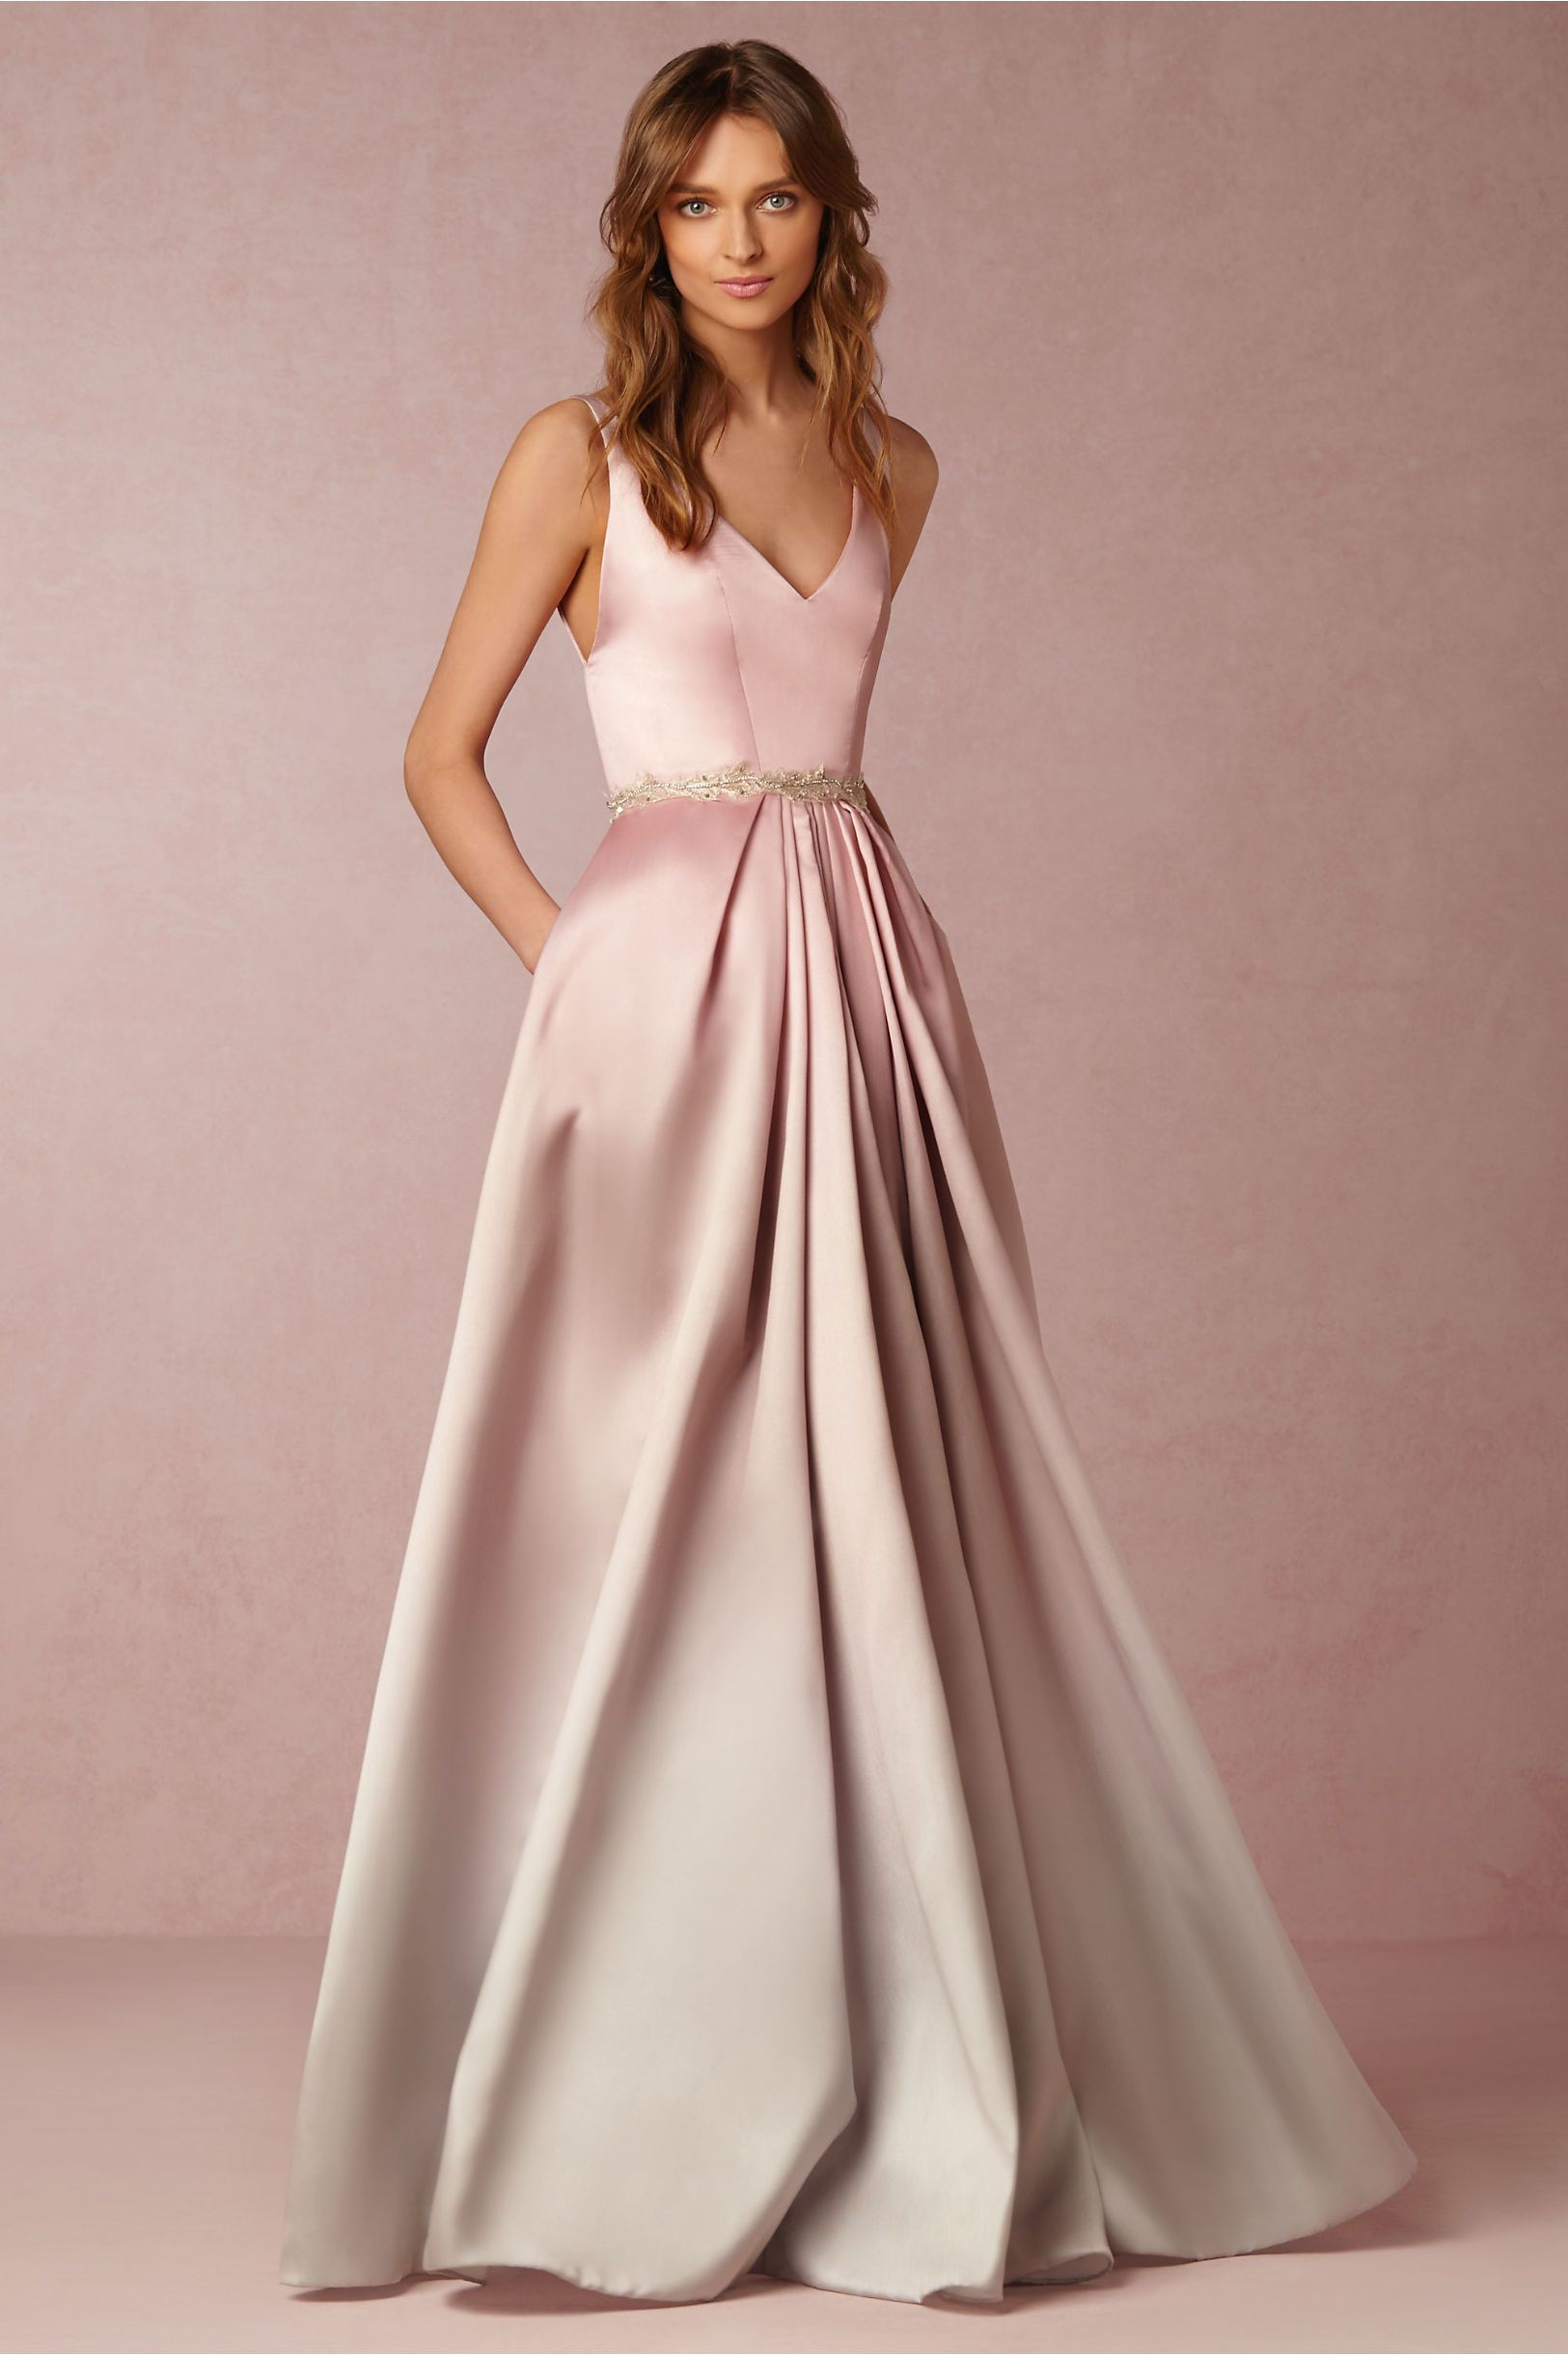 Pin de Donna en Brides | Pinterest | Vestiditos, Inspiración para ...